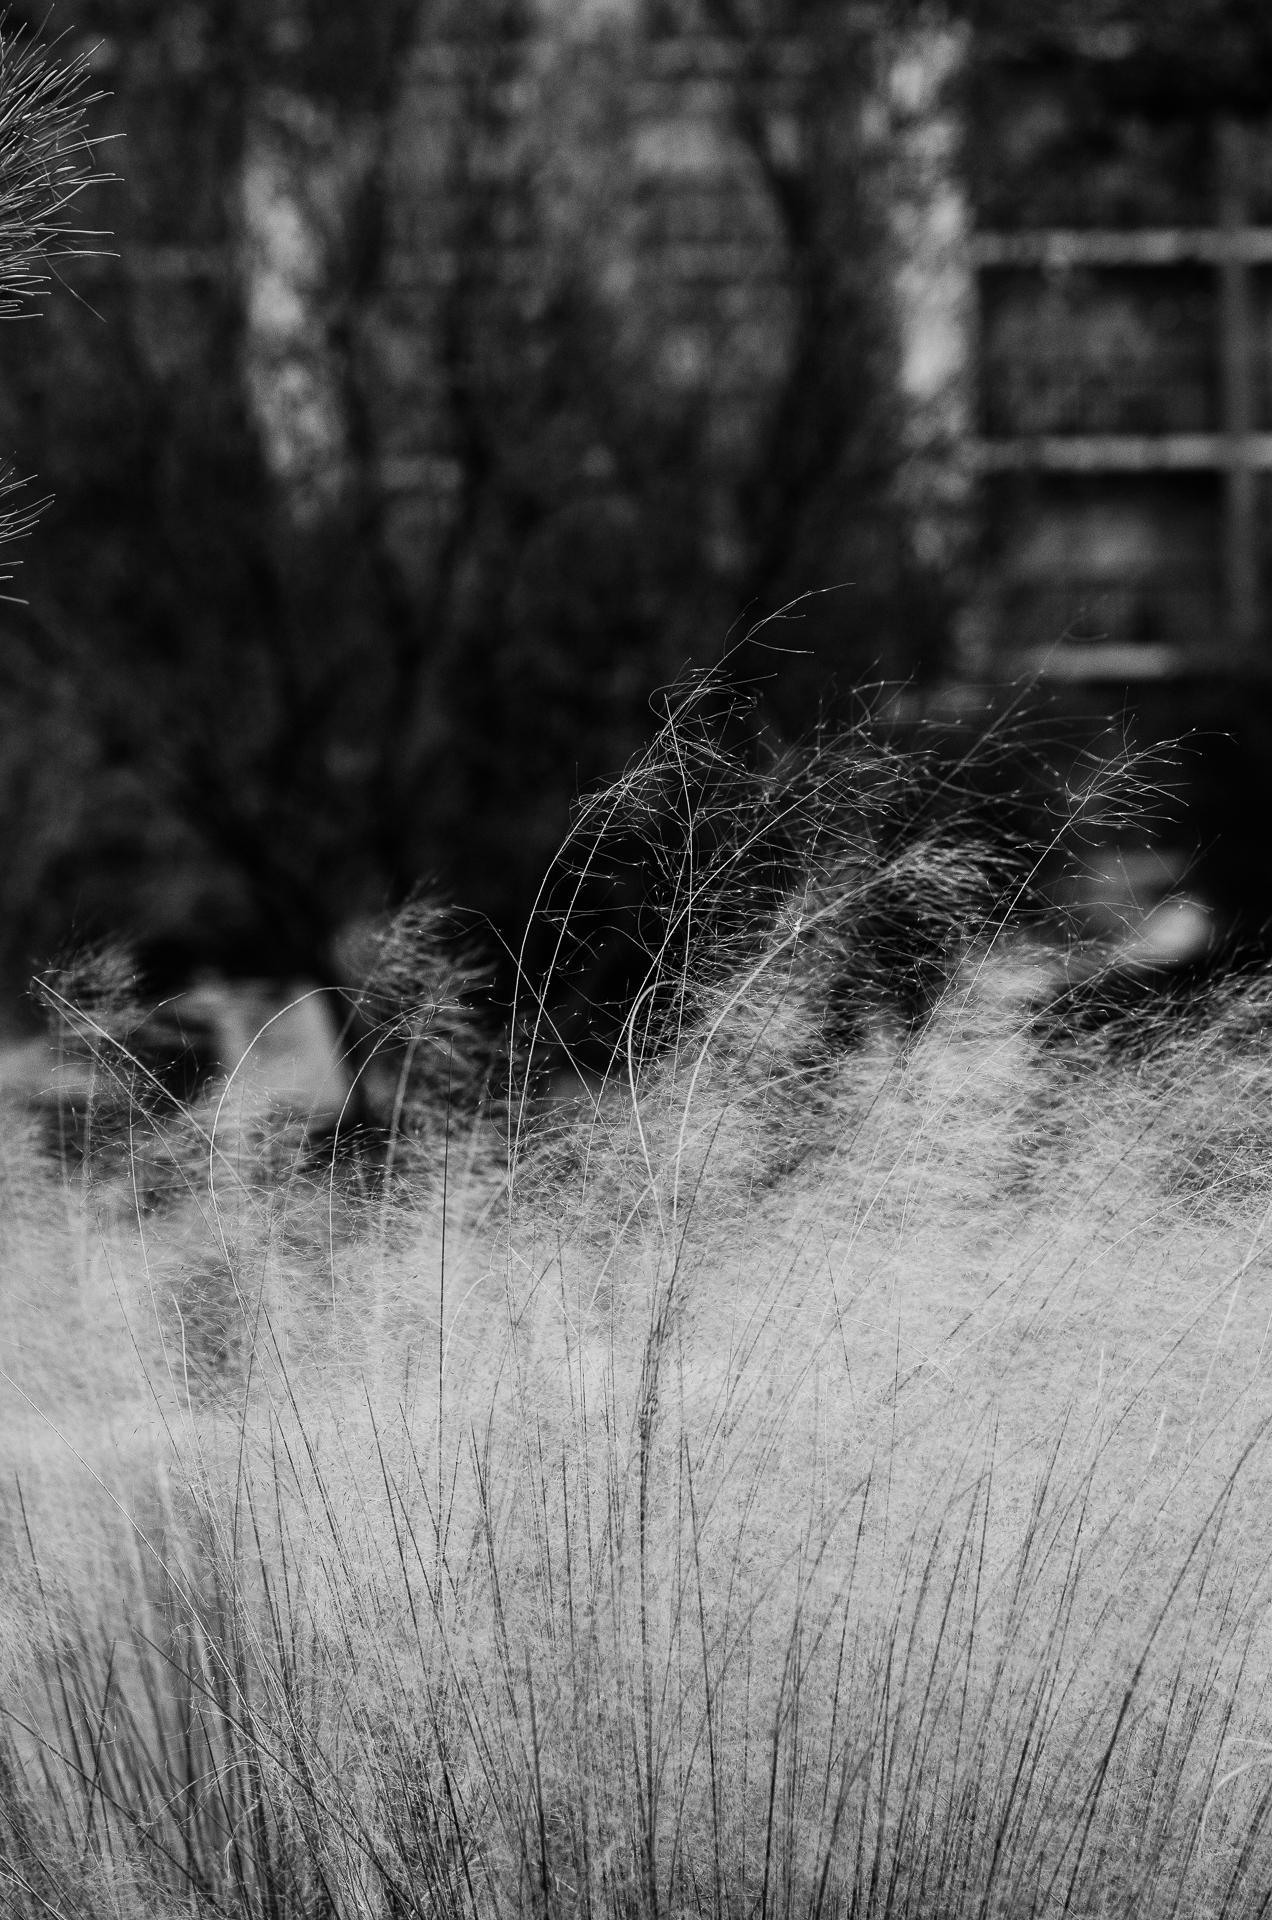 Grass in the wind, San Antonio